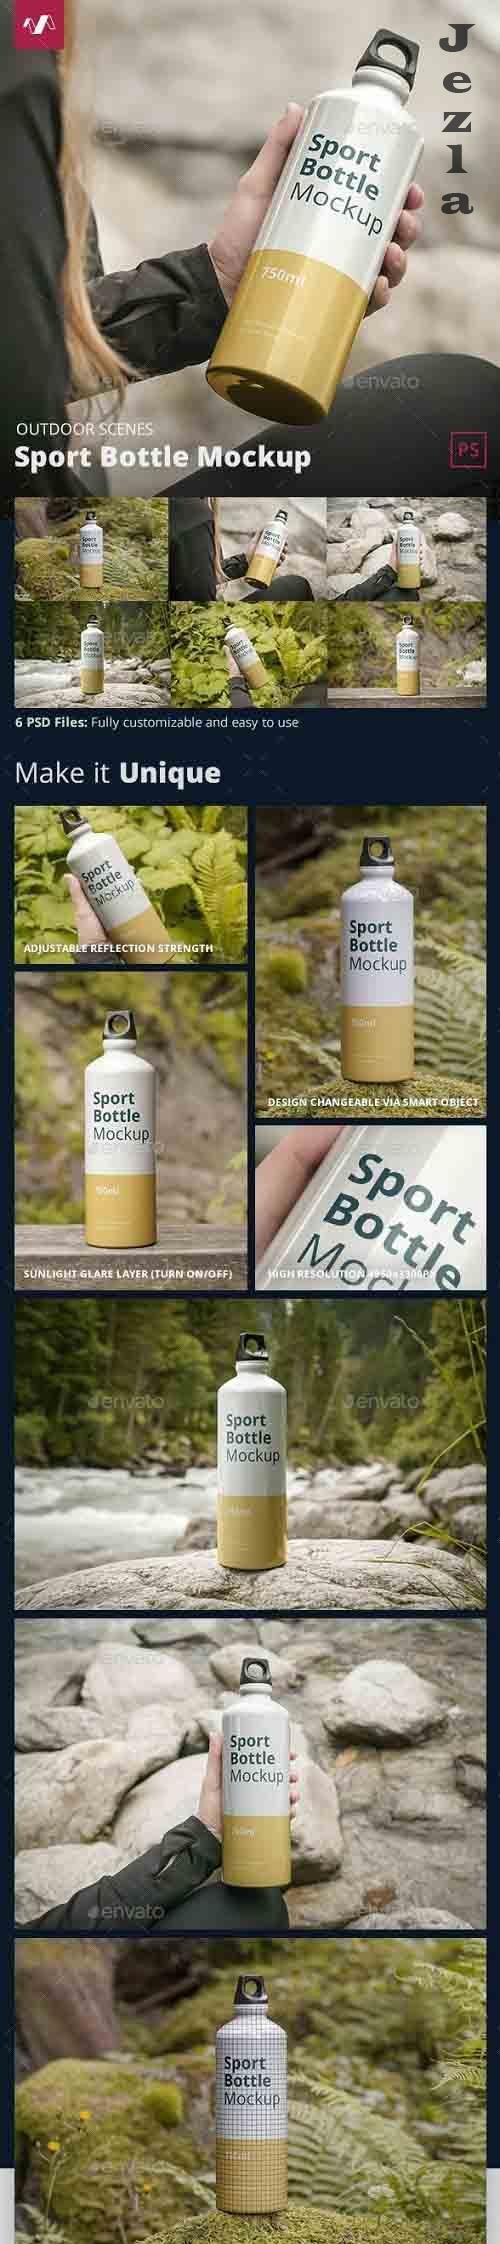 GraphicRiver - Sport Bottle Mockup Outdoor Scenes 31778751